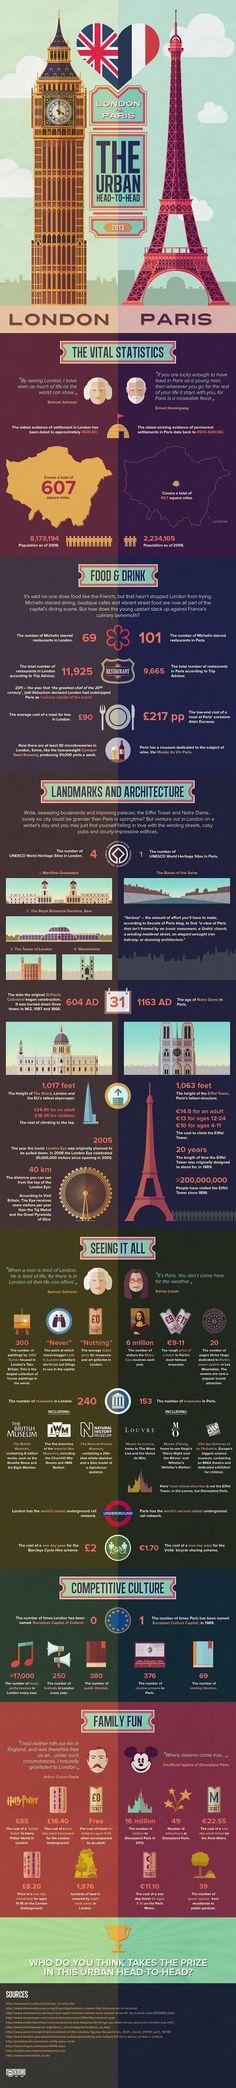 grafiker.de - INFOGRAFIK: London vs. Paris